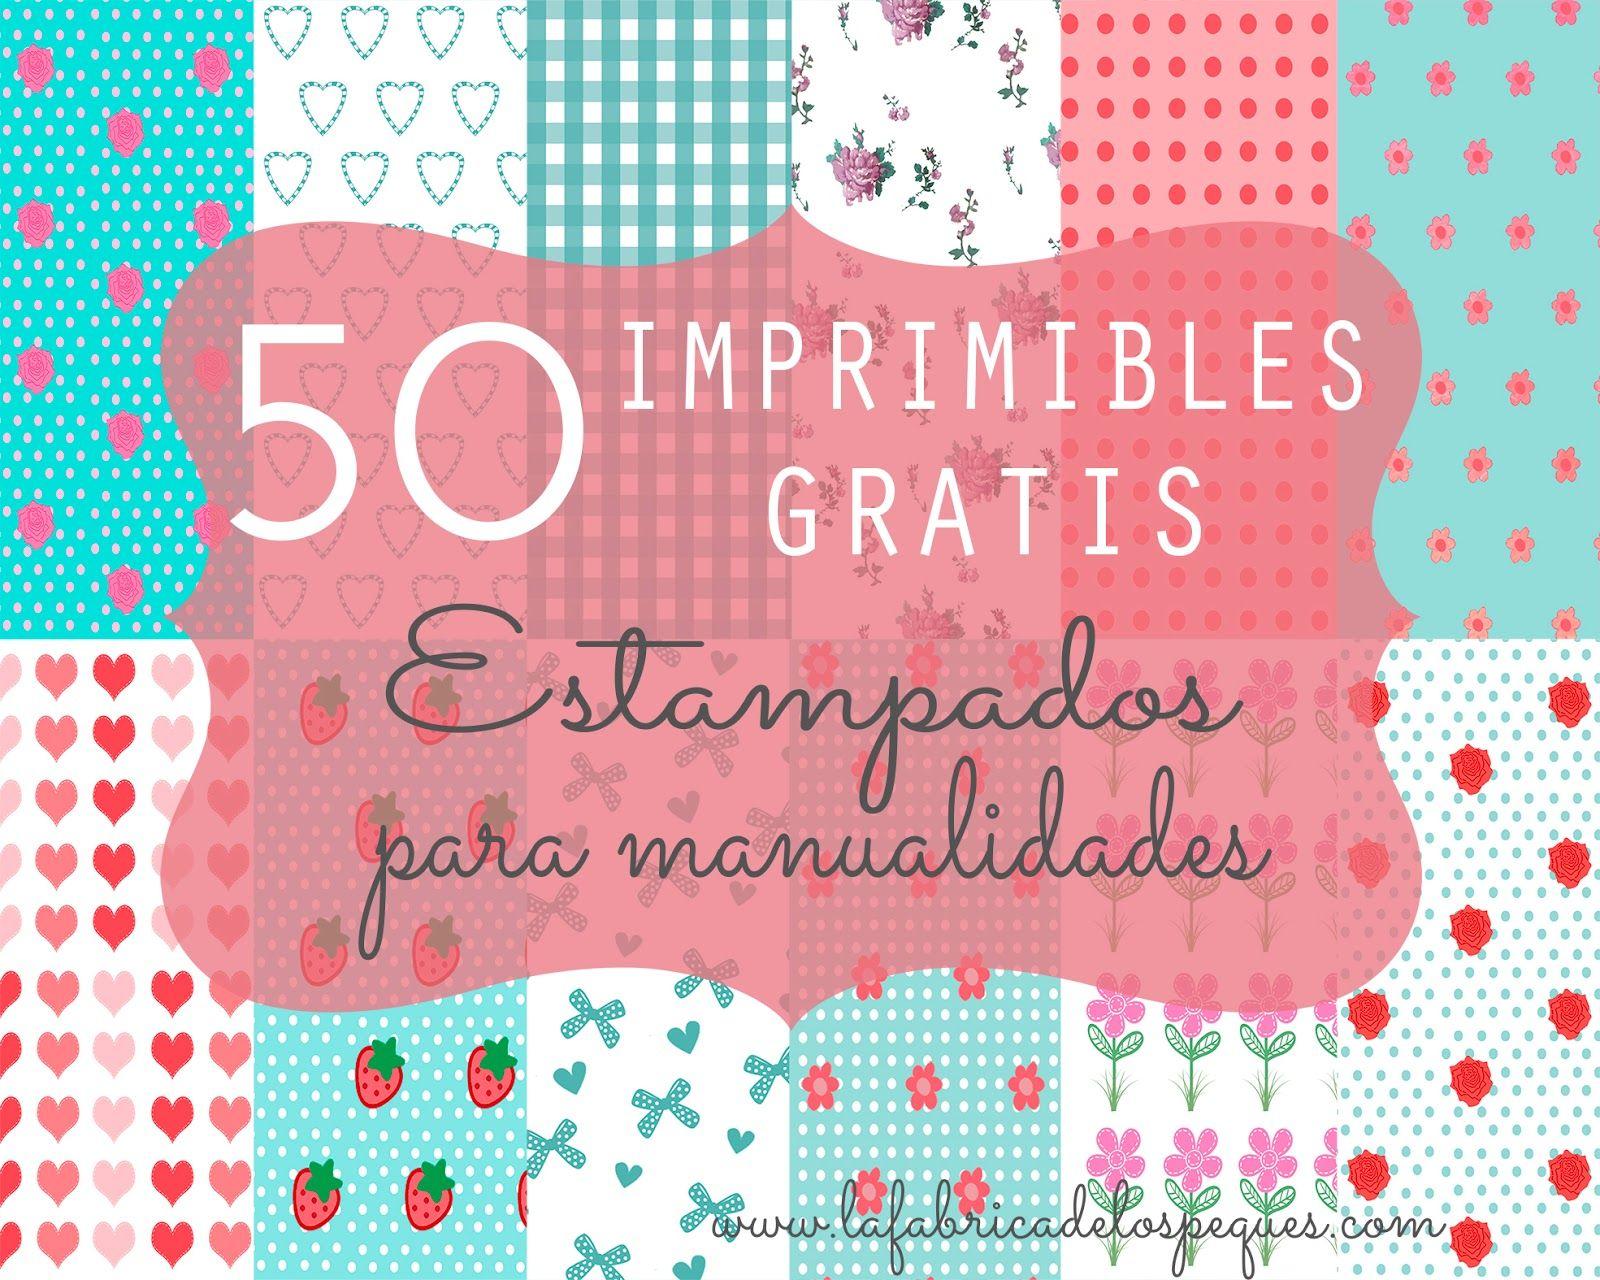 50 imprimibles gratis estampados para manualidades | Manualidades ...